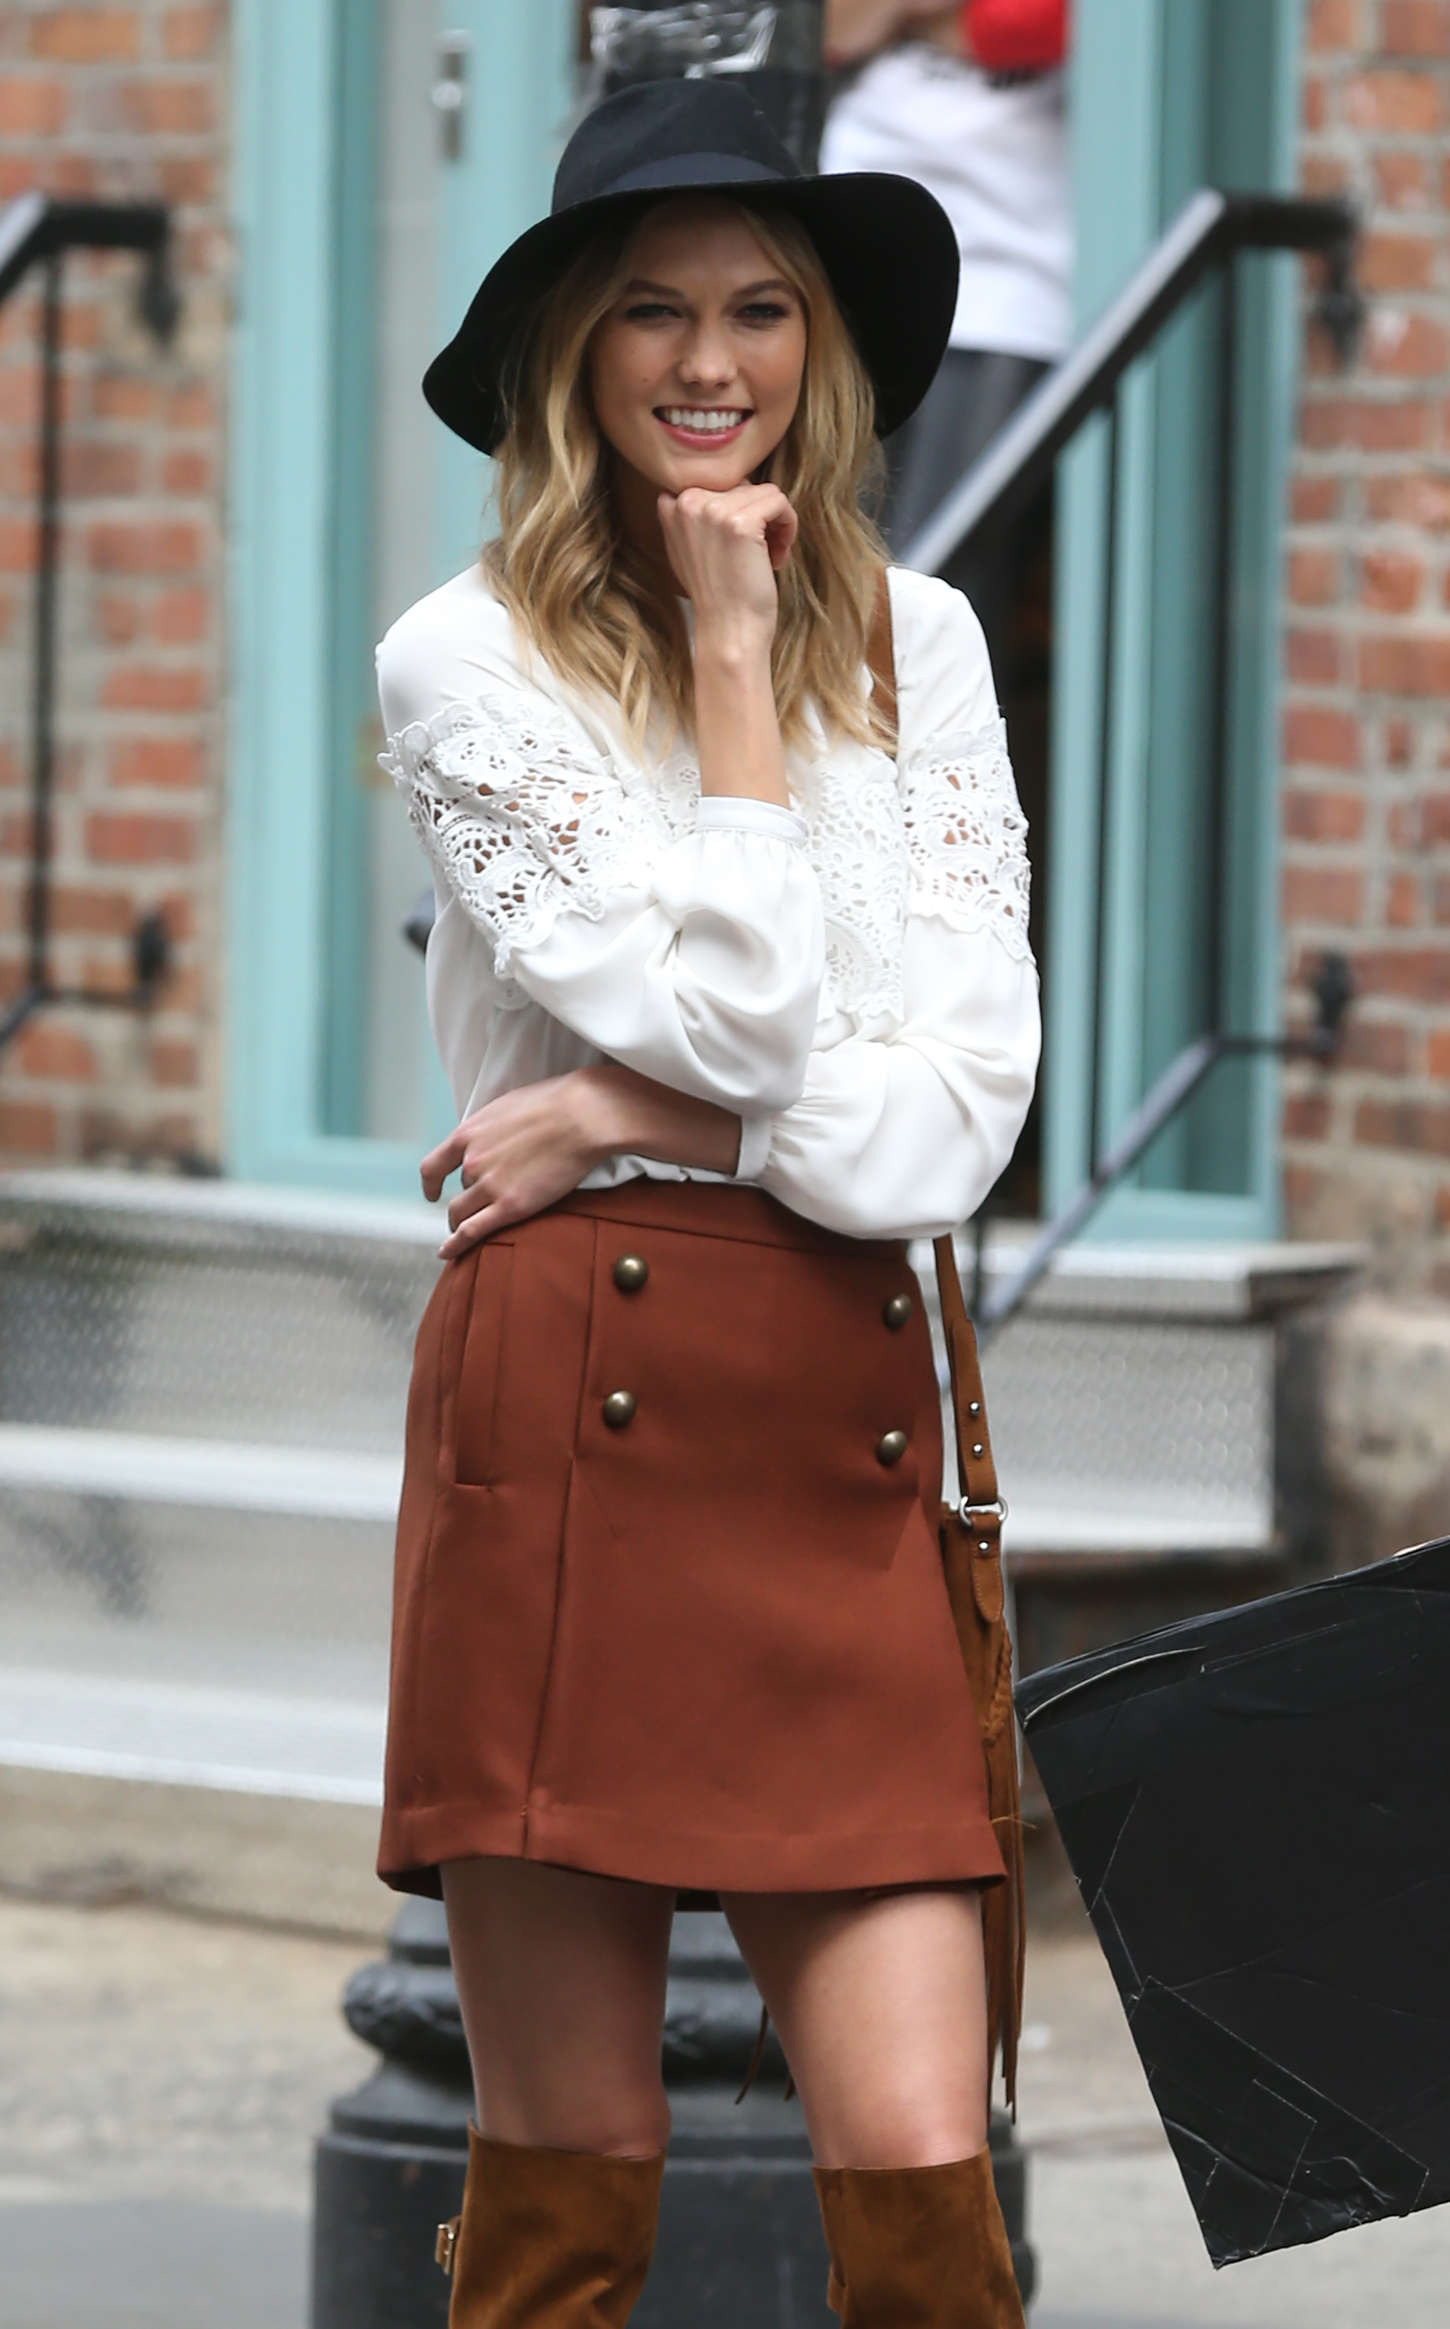 Karlie Kloss 2015 : Karlie Kloss: Photoshoot in NYC -14